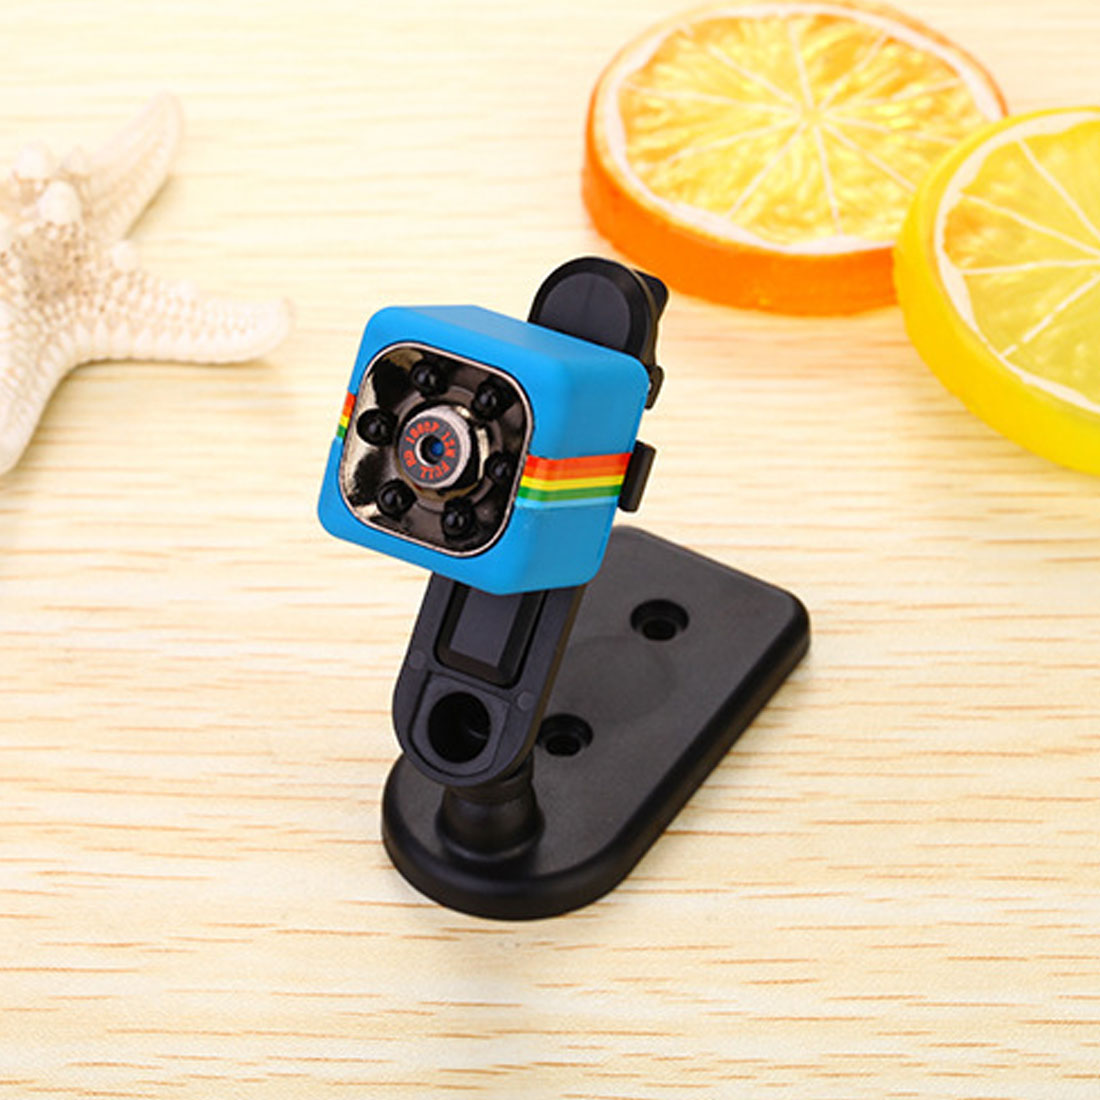 HONGDAK SQ11 Bonito Mini Câmera HD 1080 P Esportes Mini DV Filmadora HD Night Vision Mini Câmera Aérea Vídeo Voz registro